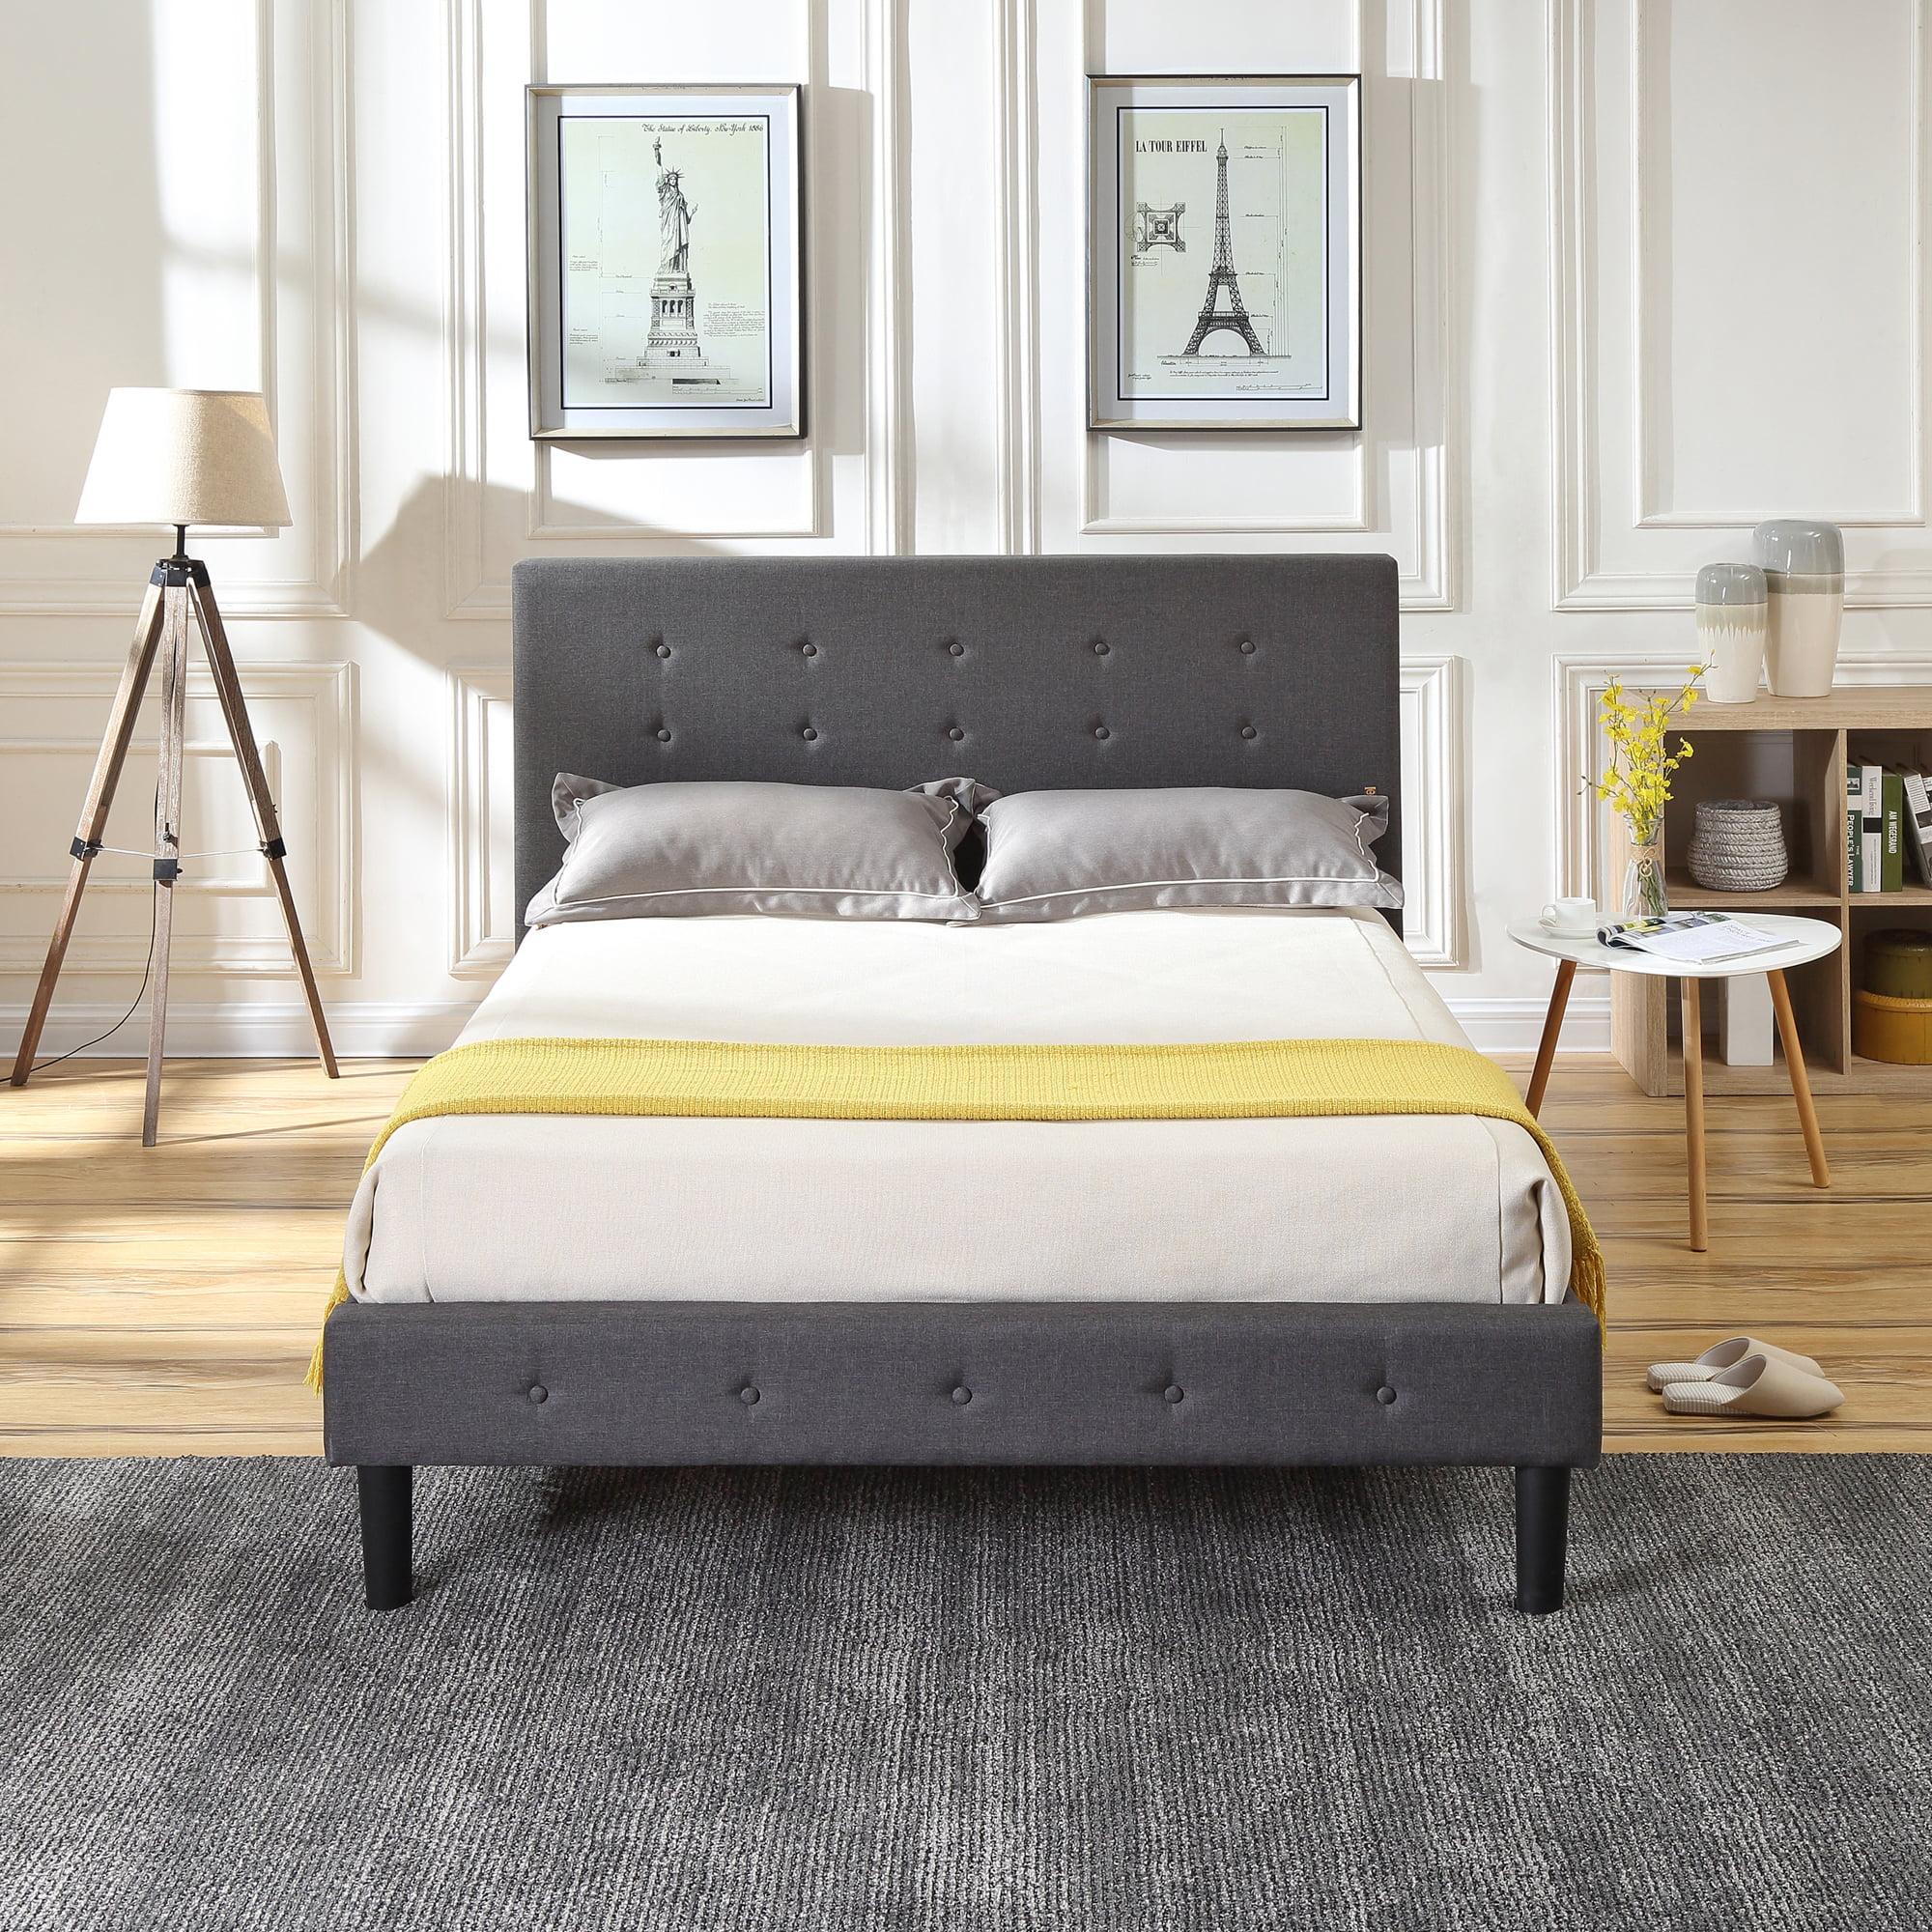 Modern Sleep Cambridge Upholstered Platform Bed   Headboard and Metal Frame with Wood Slat Support   Grey, Multiple Sizes